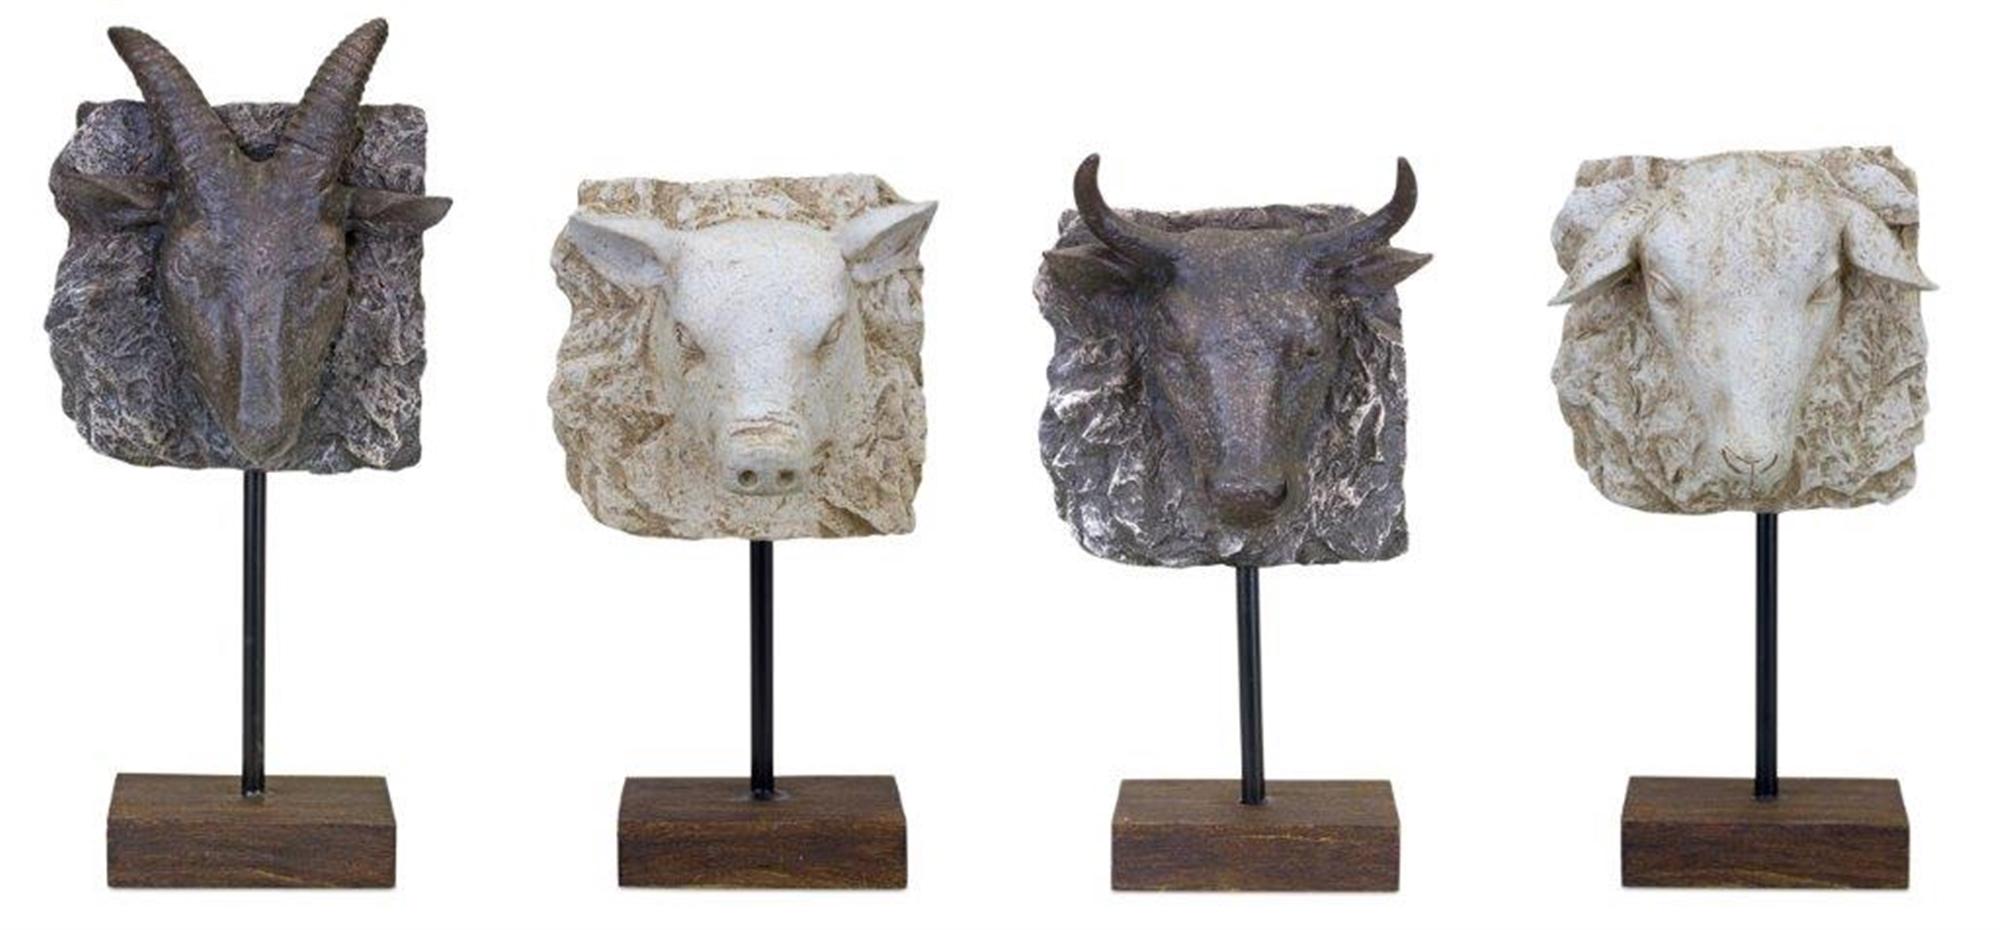 "Animal Sculpture (Set of 4) 12""H, 12""H, 12""H, 14""H Resin"